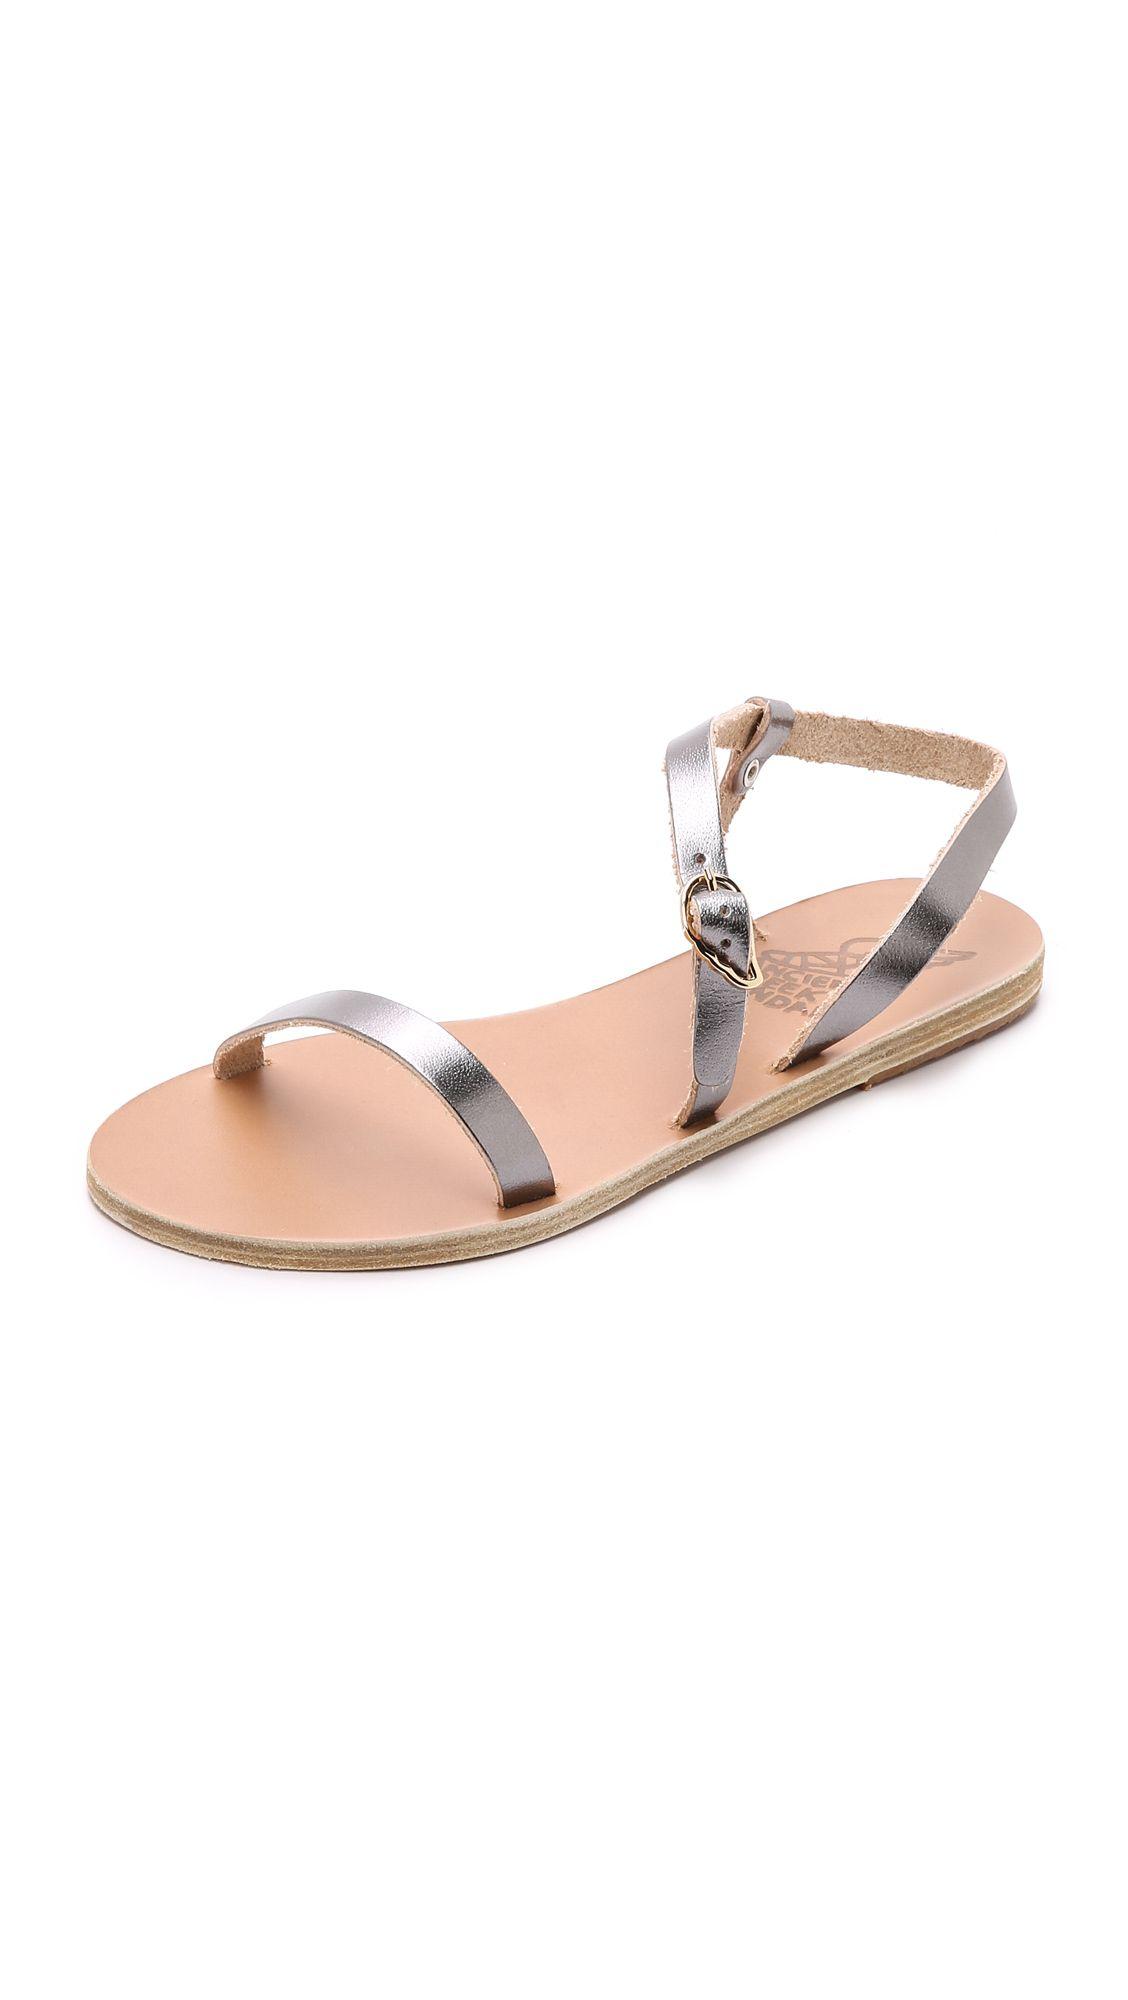 Ancient Greek Sandals Niove Sandals - Steel | SHOPBOP.COM saved by #ShoppingIS